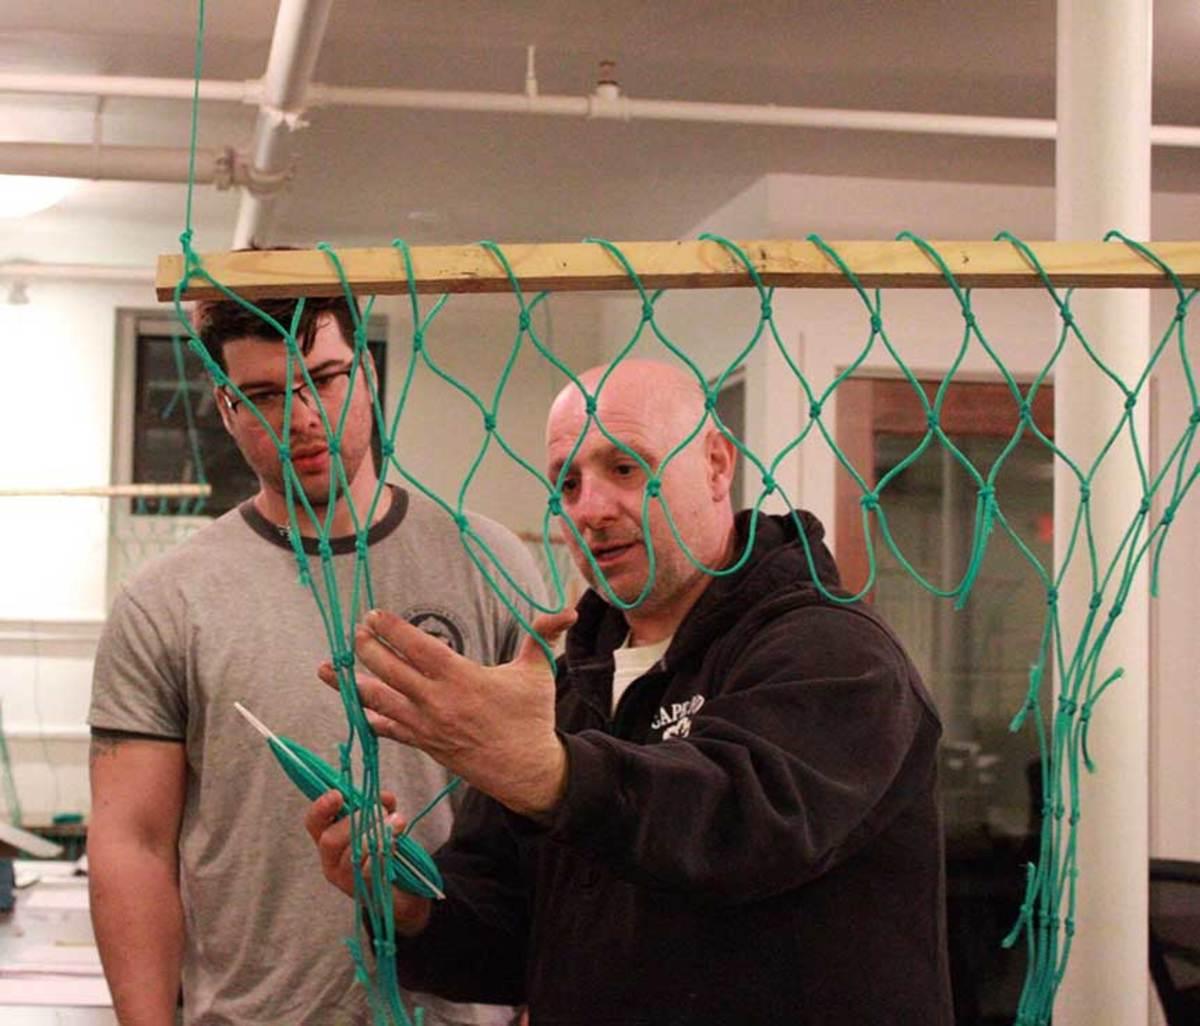 Joe Sanfilippo (right) teaches the critical skill of net-mending.